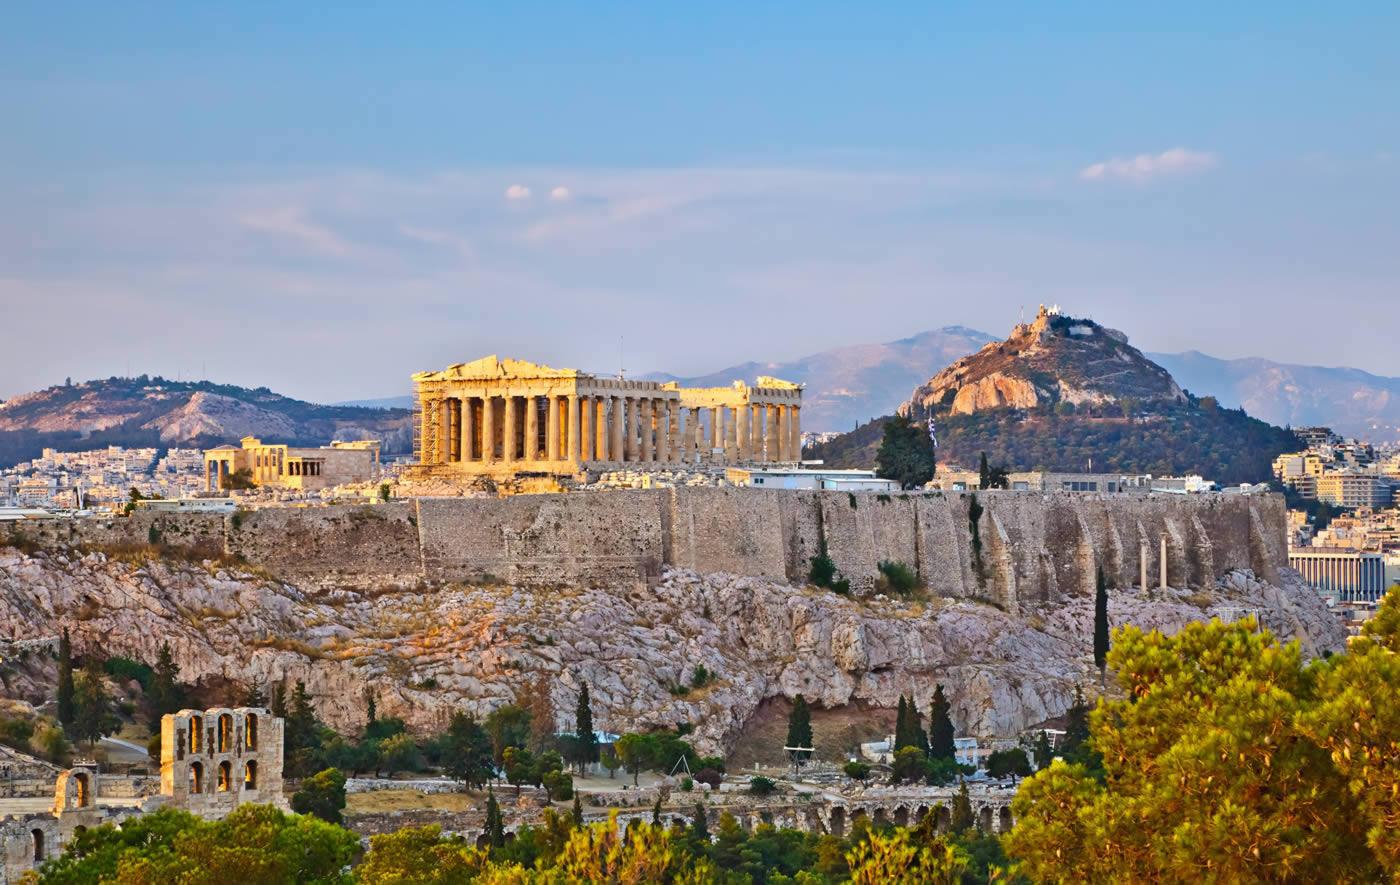 http://www.prasannaholidays.com/wp-content/uploads/2015/04/greek3.jpg